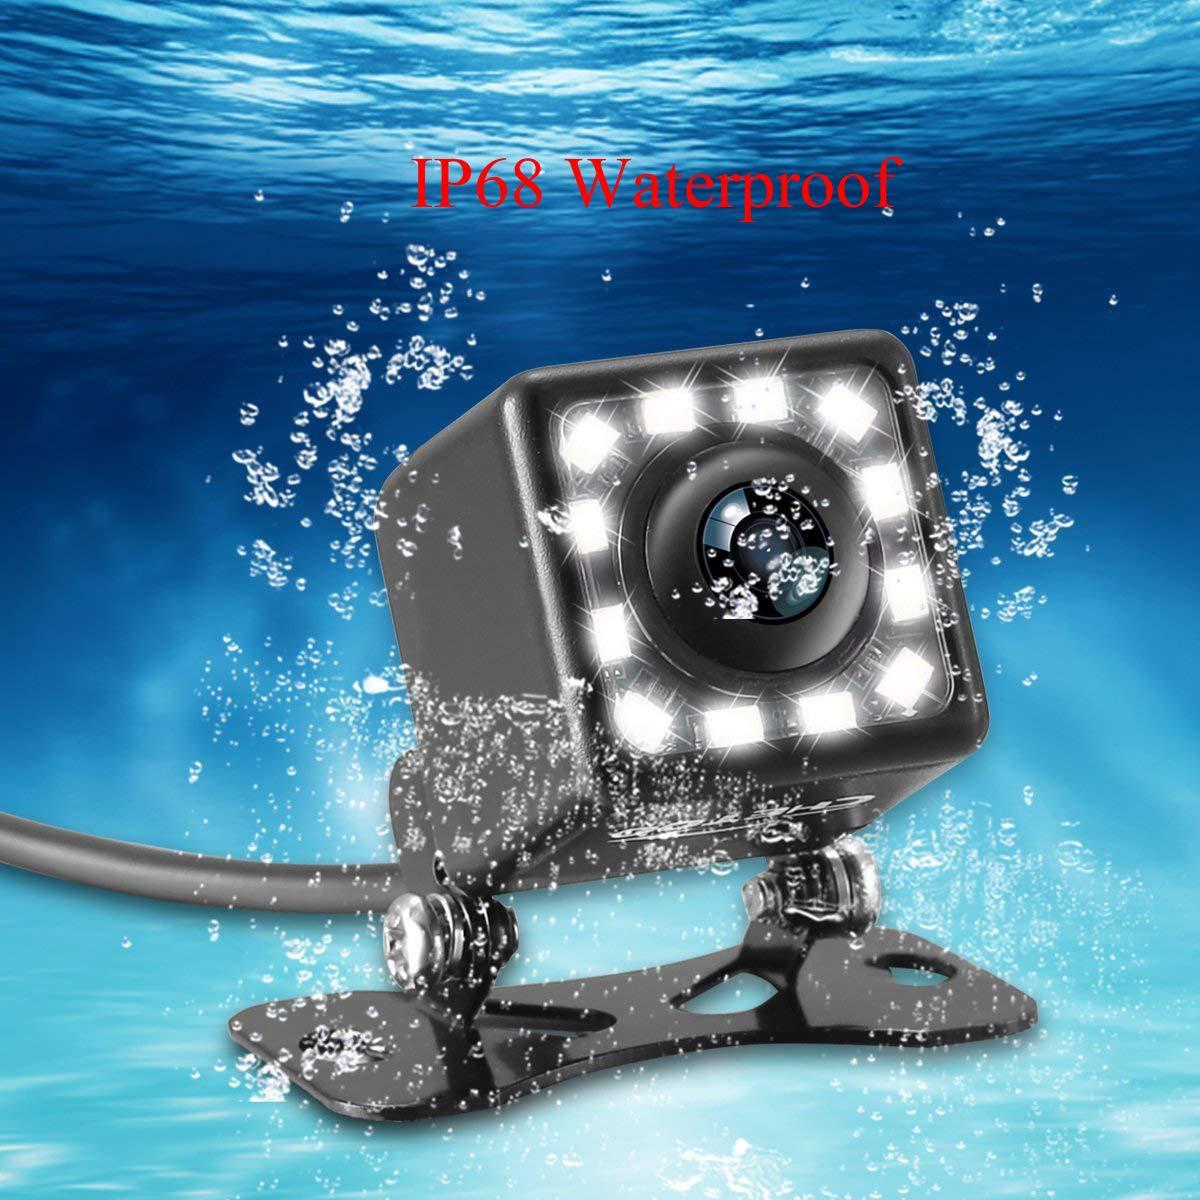 aSATAH 8 LED Car Rear View Camera for KIA VQ//Carnival//Sedona//Grand Carnival//Sedona//Carnival R /& HD CCD Night Vision Waterproof and Shockproof Reversing Backup Camera 8 LED